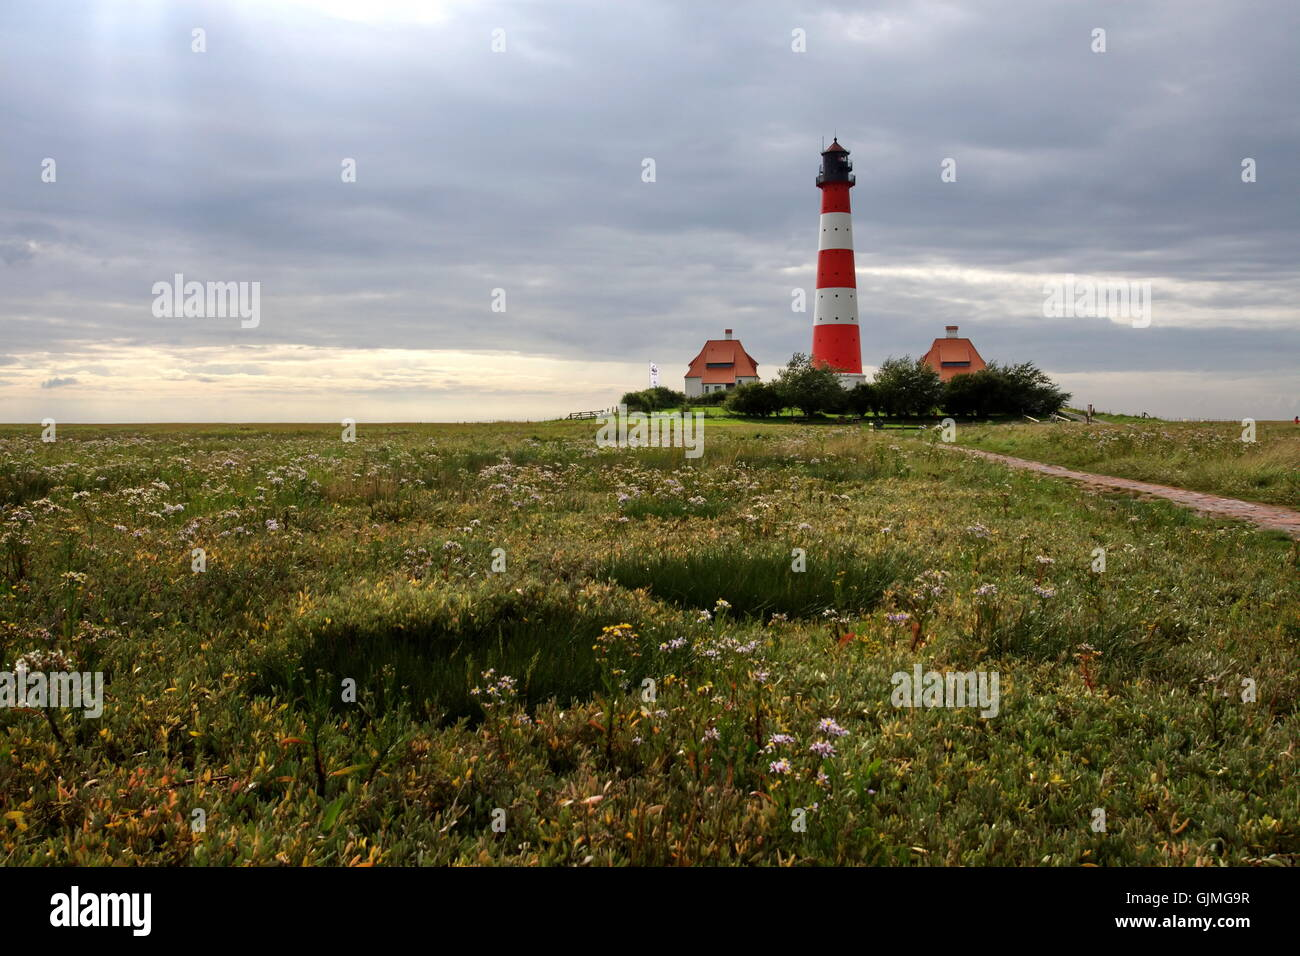 Northern Germany nordfriesland lighthouse - Stock Image